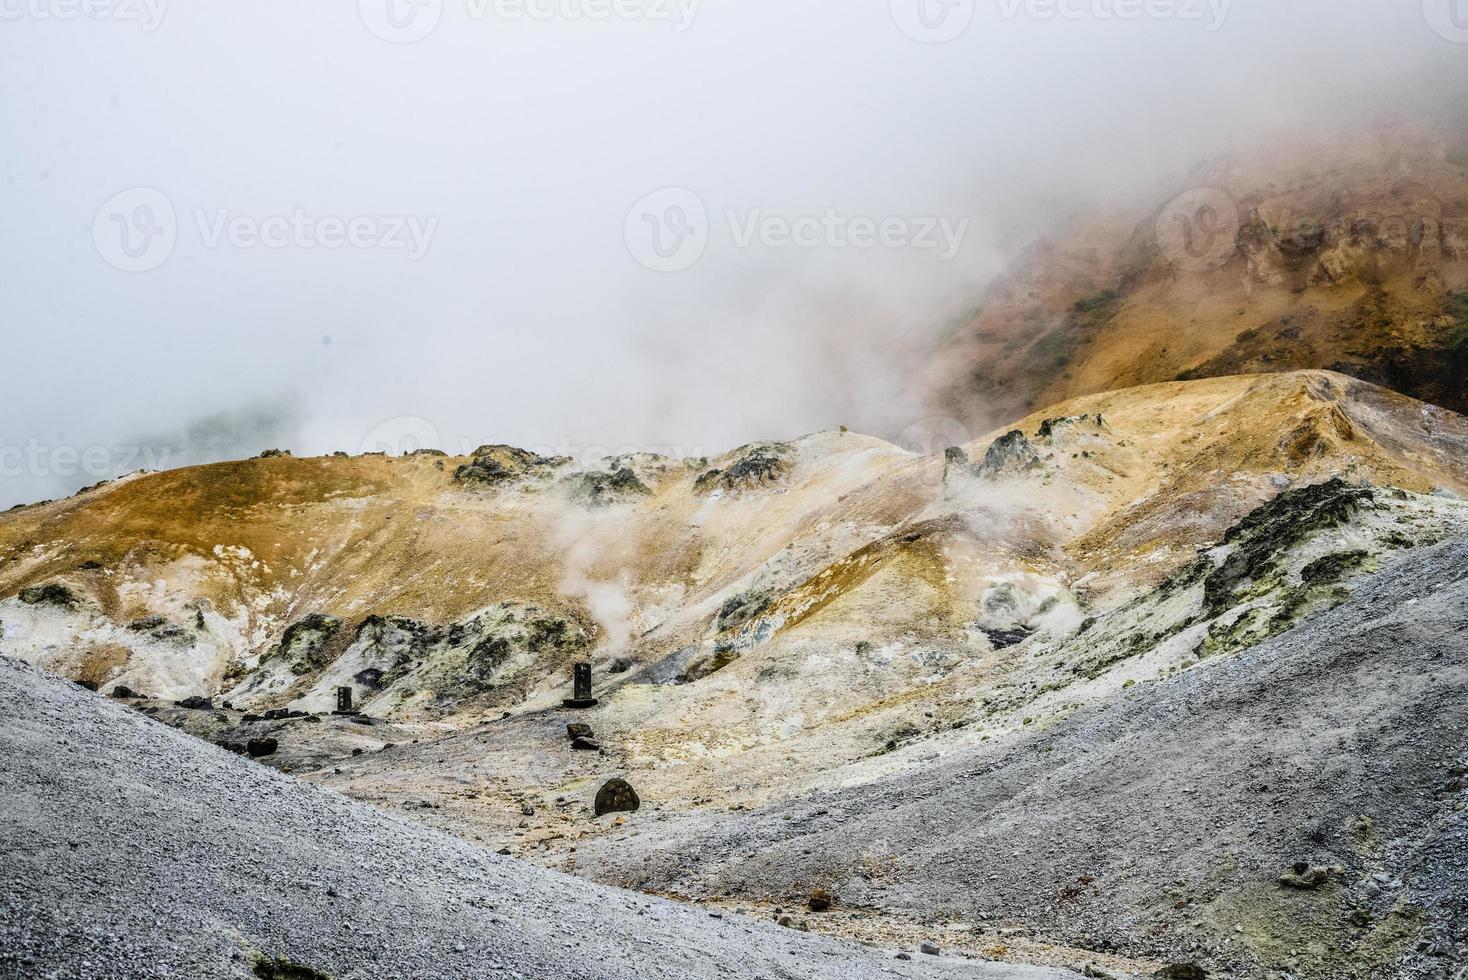 jigokudani helvete berg i noboribetsu japan10 foto